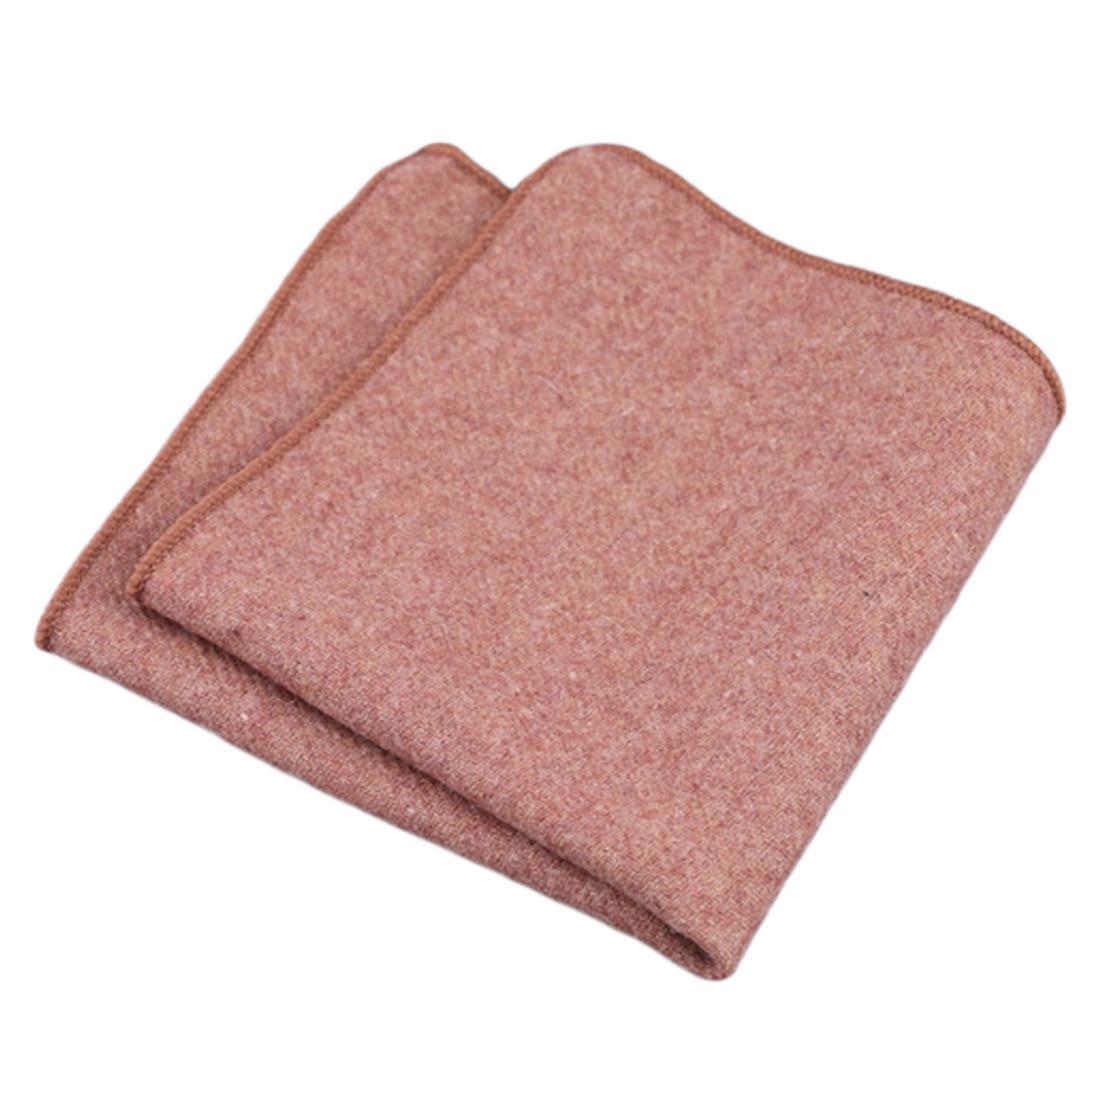 Vintage Wool Hankies Hankerchief ScarvesMen's Pocket Square Handkerchiefs Striped Solid Cotton 23*23cm